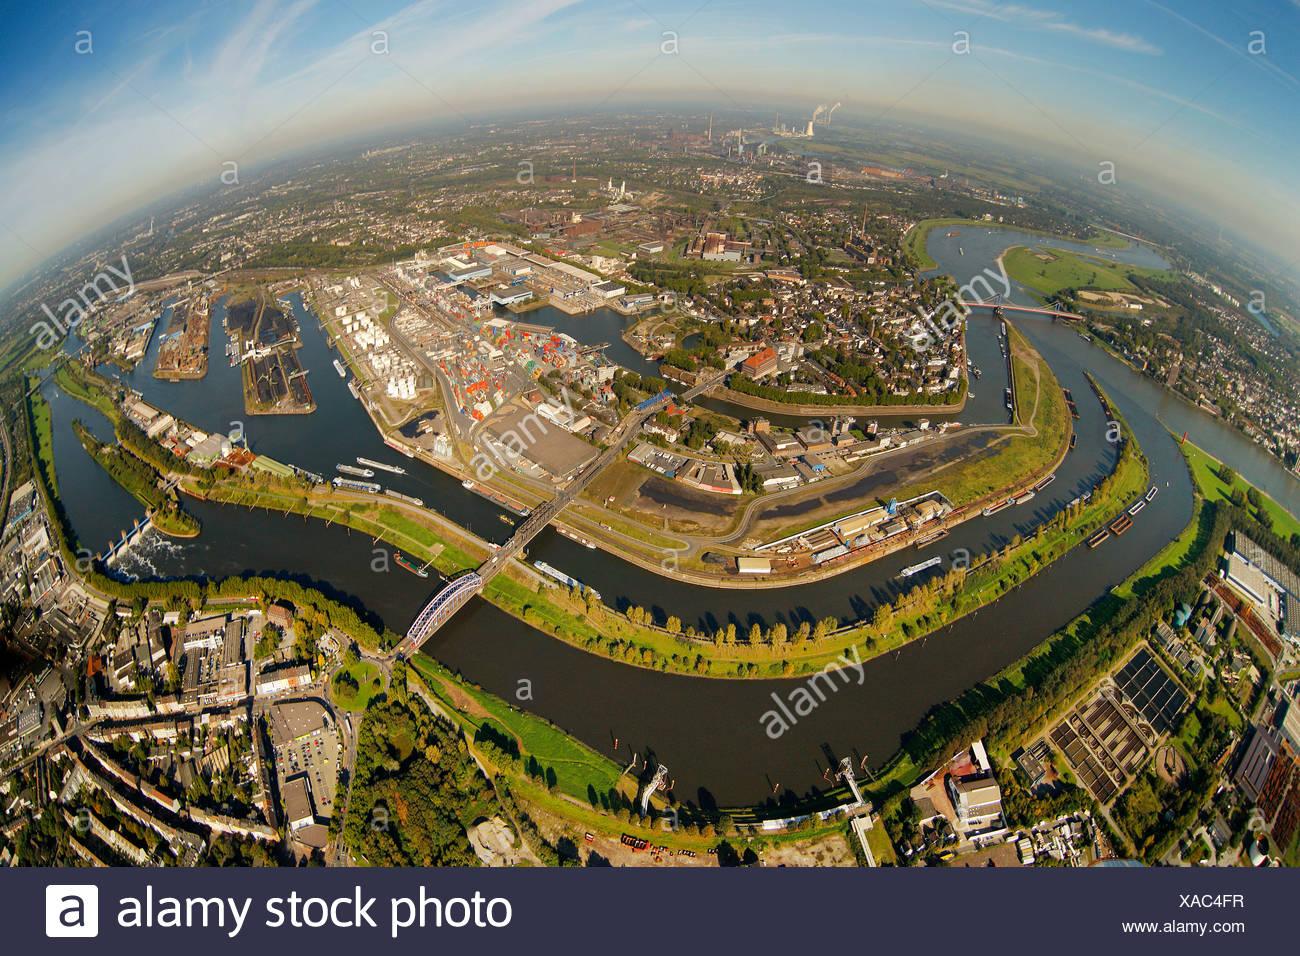 Aerial view, port of Duisburg, Duisport, container port, coal dock, Ruhr river, Rhine, Ruhrort quarter, Duisburg, Ruhr Area - Stock Image